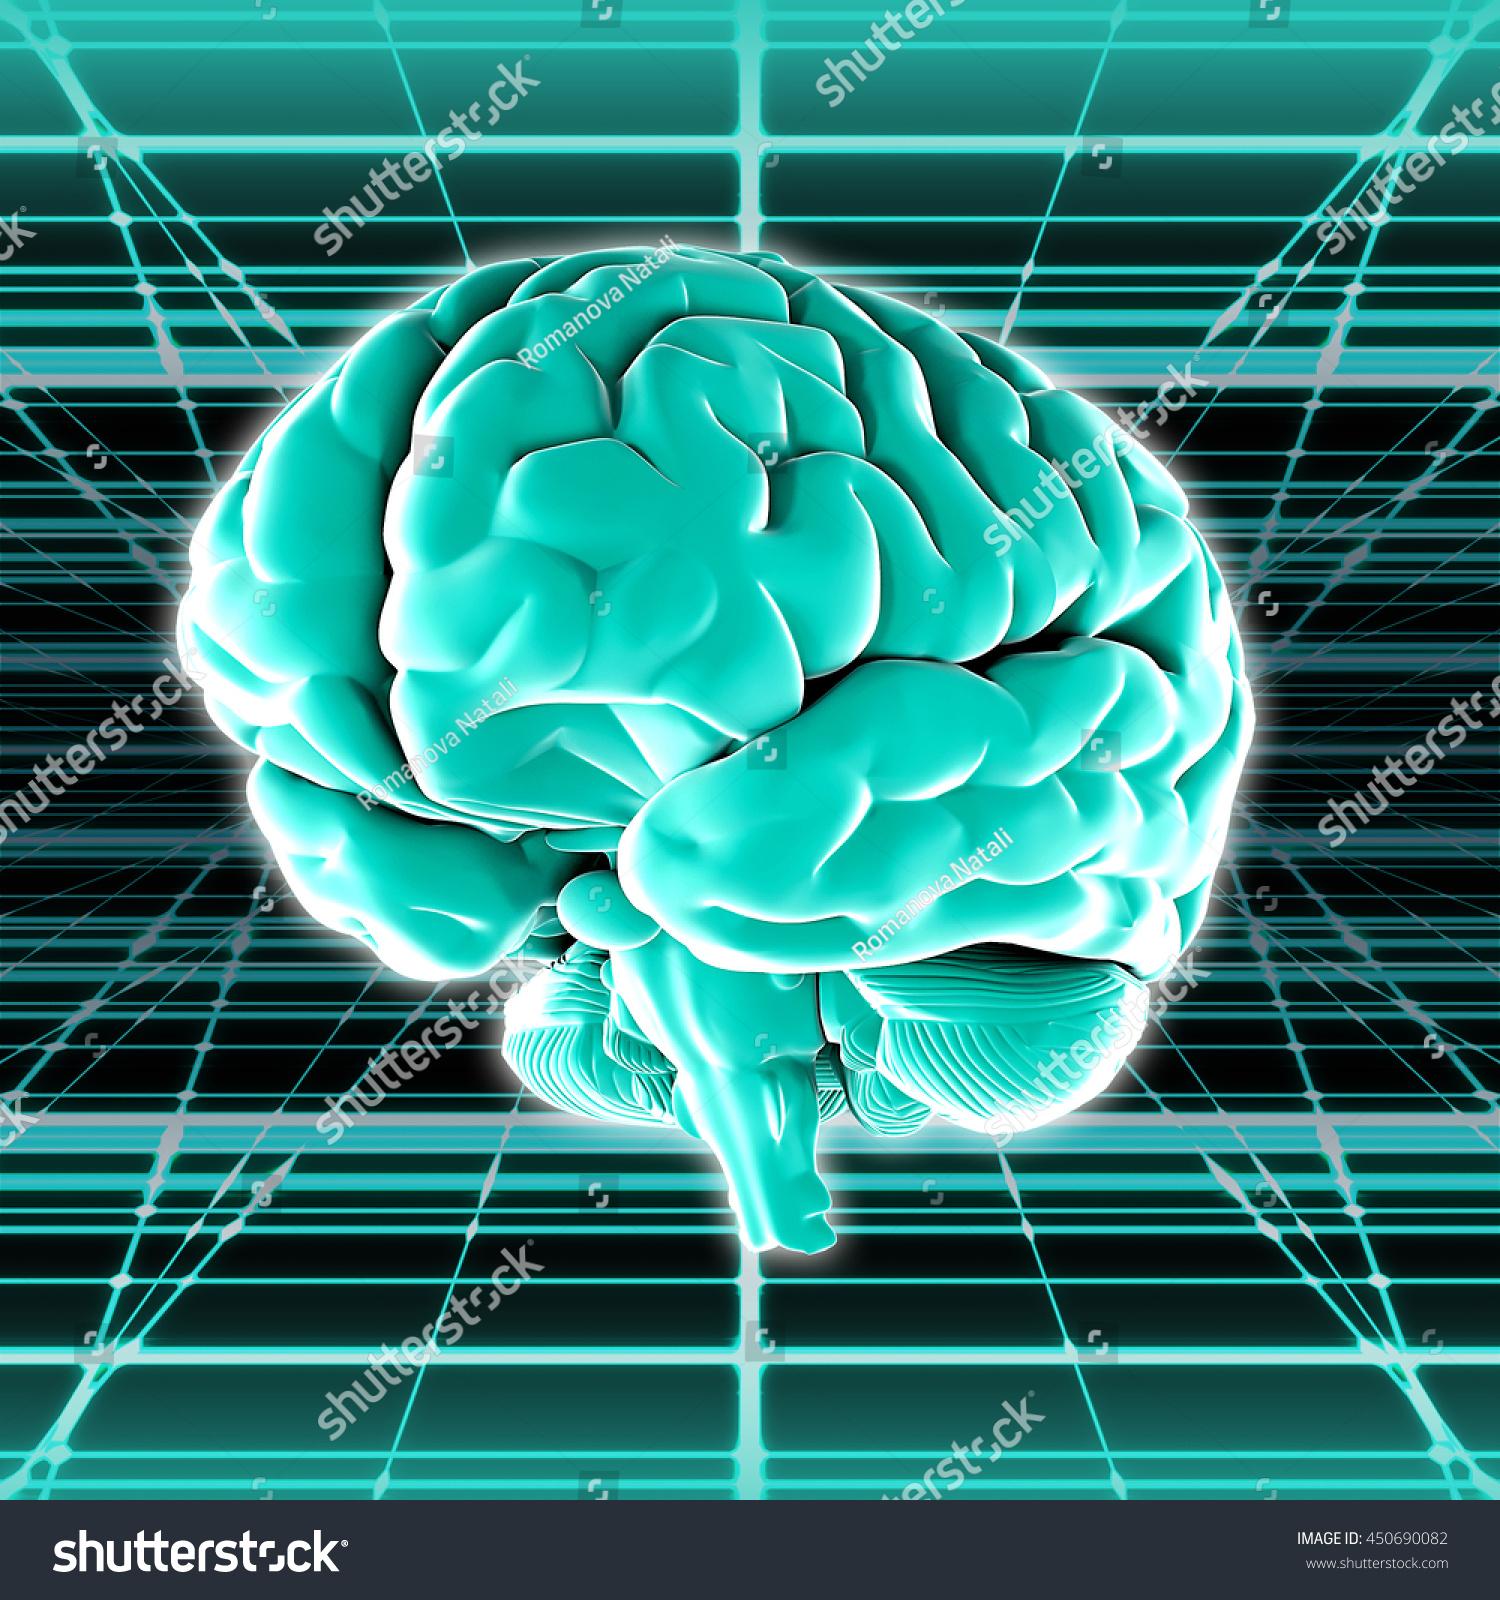 Virtual Surround Brain Image Digital Space 3 D Stock Illustration